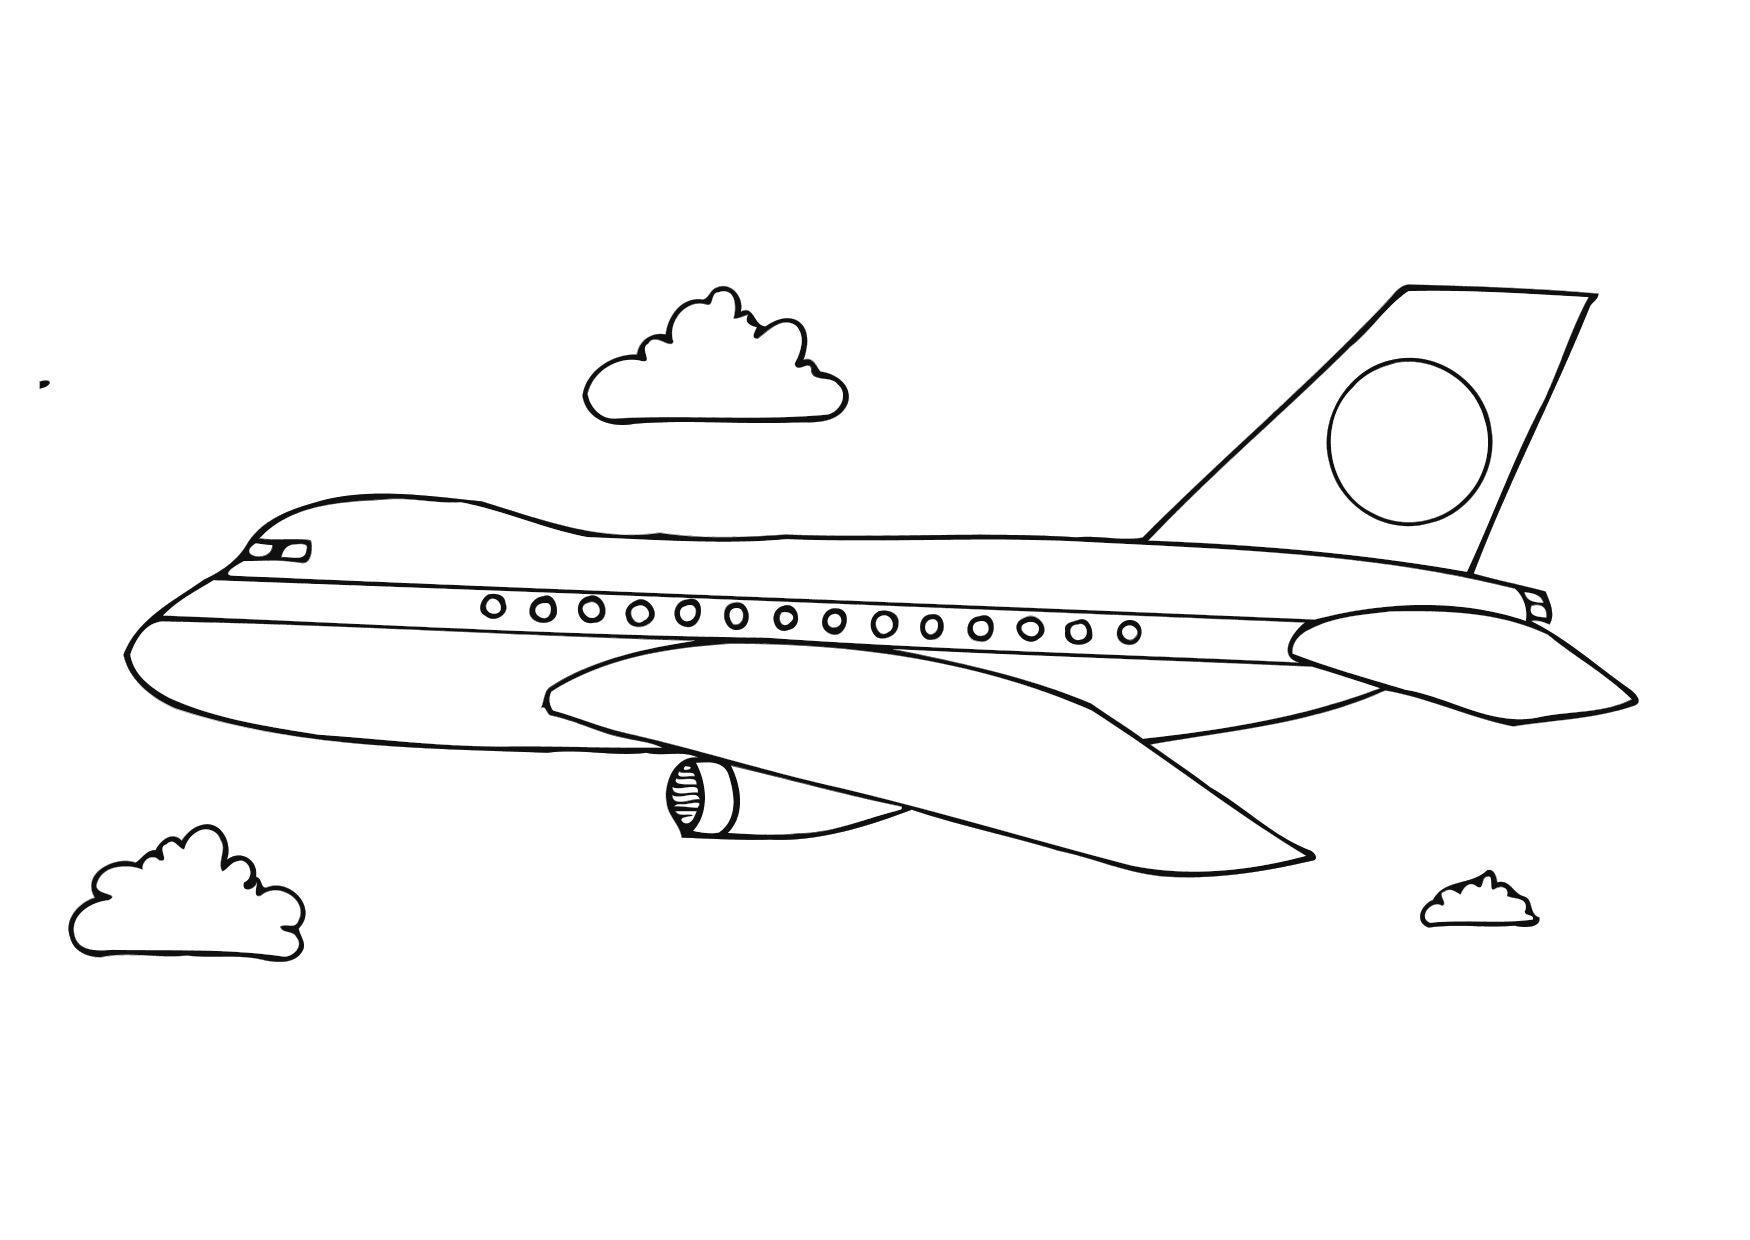 Malvorlage Flugzeug | Ausmalbild 12281.